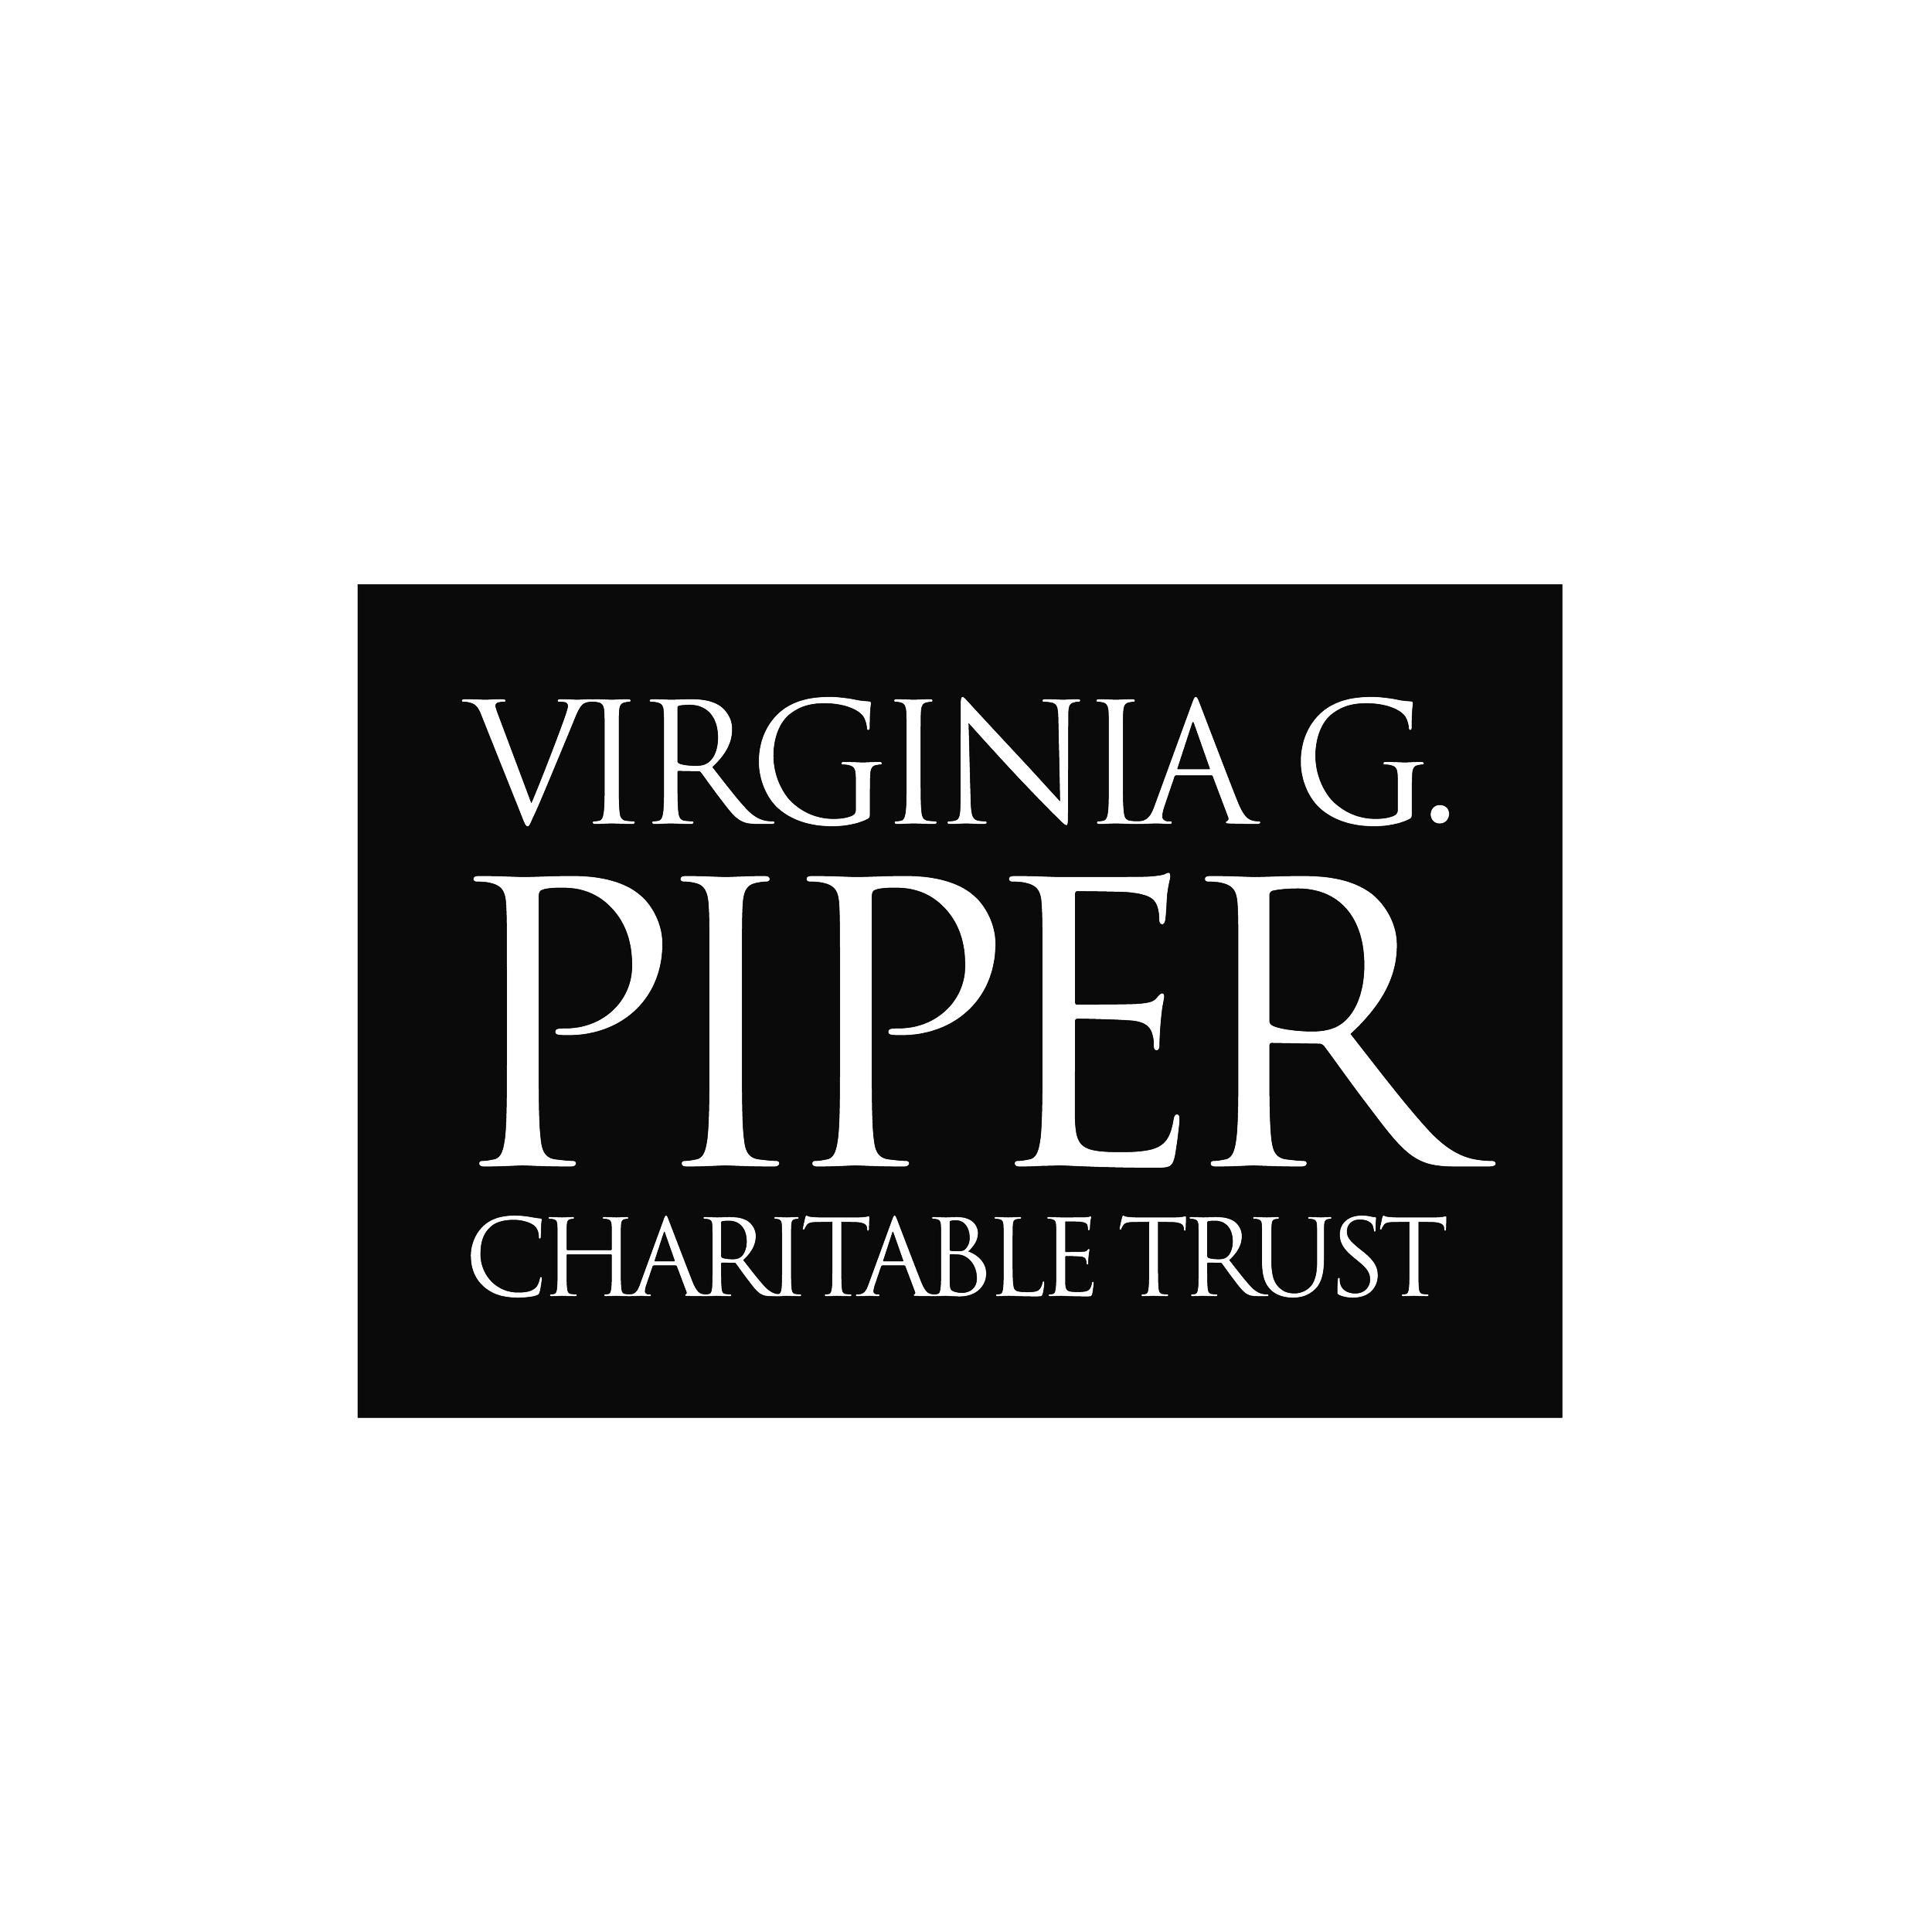 ImpactMaker_Supporter_logos_piper.png